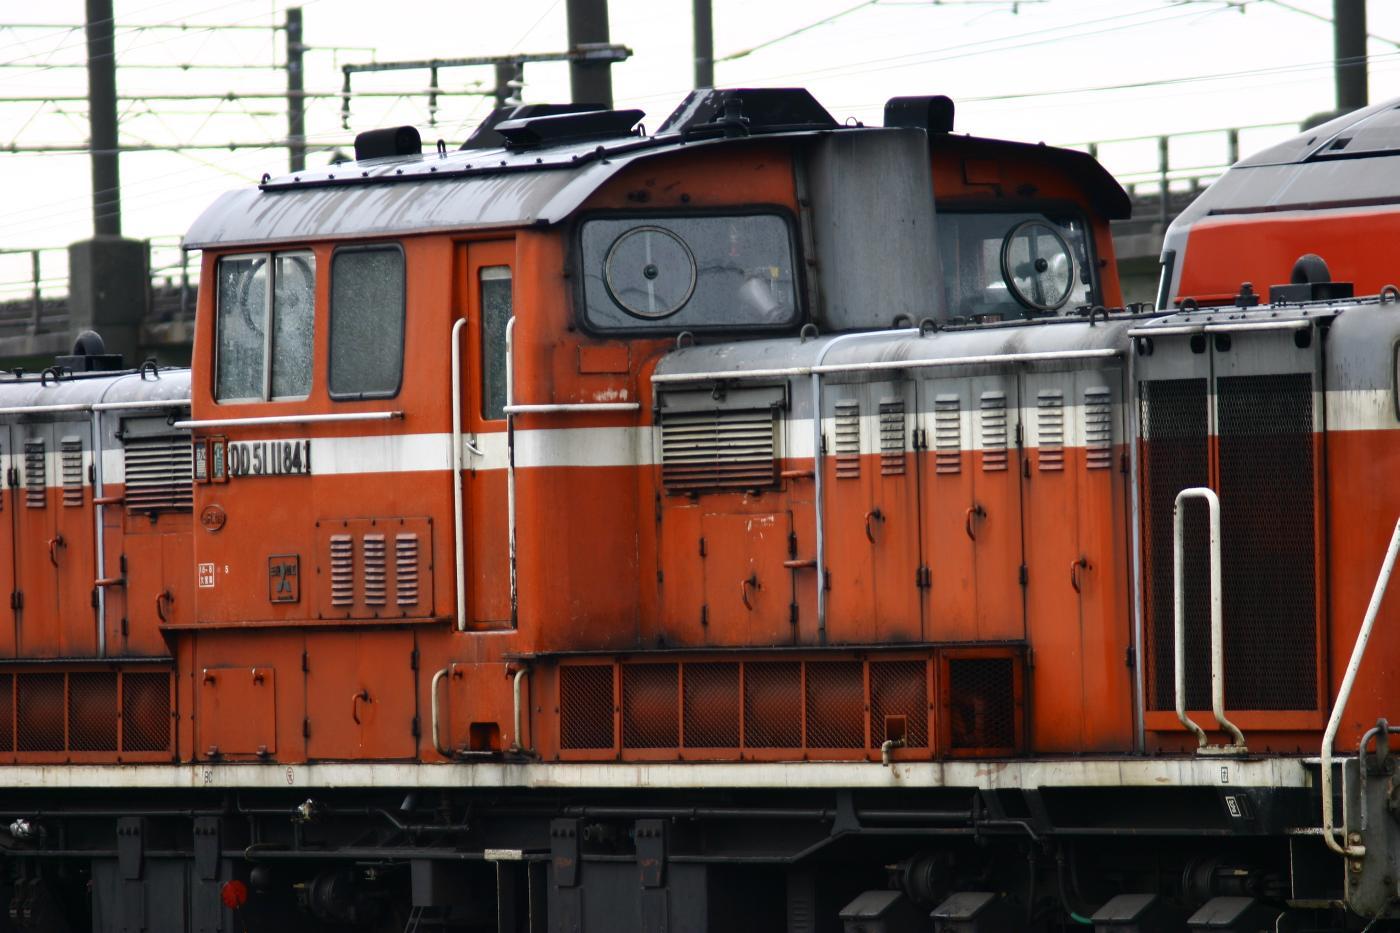 S120505003